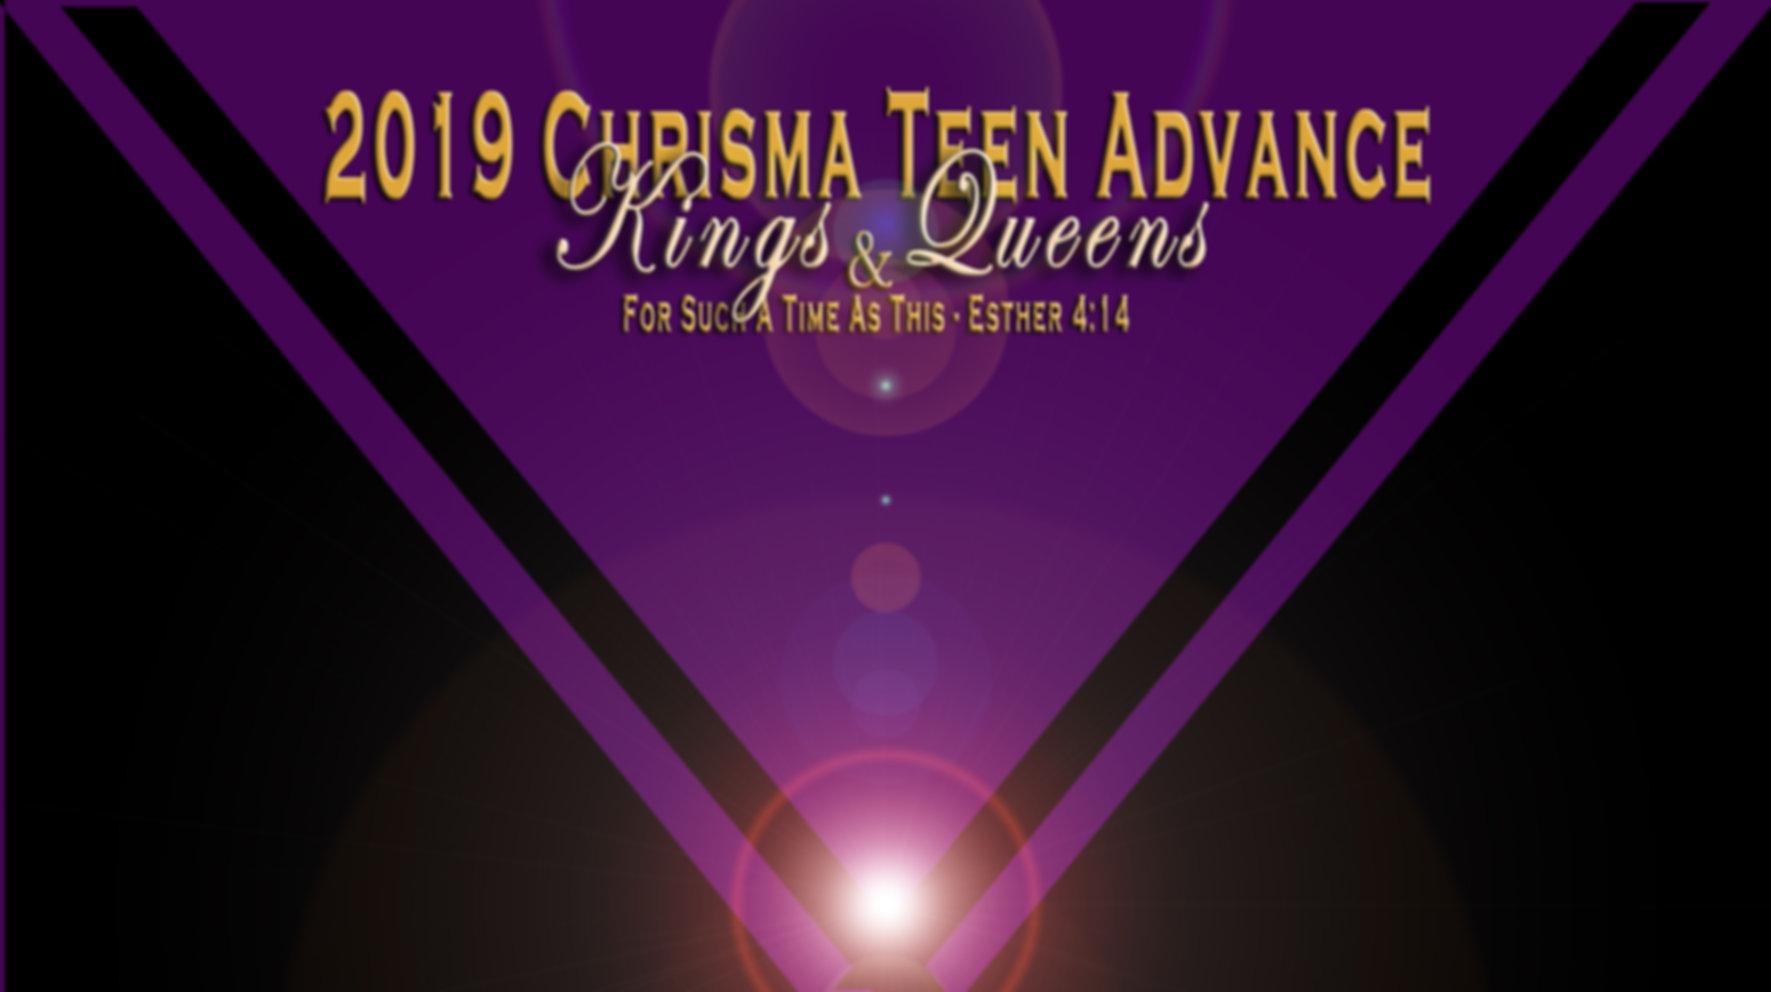 2019 Chrisma Conference Background.jpg